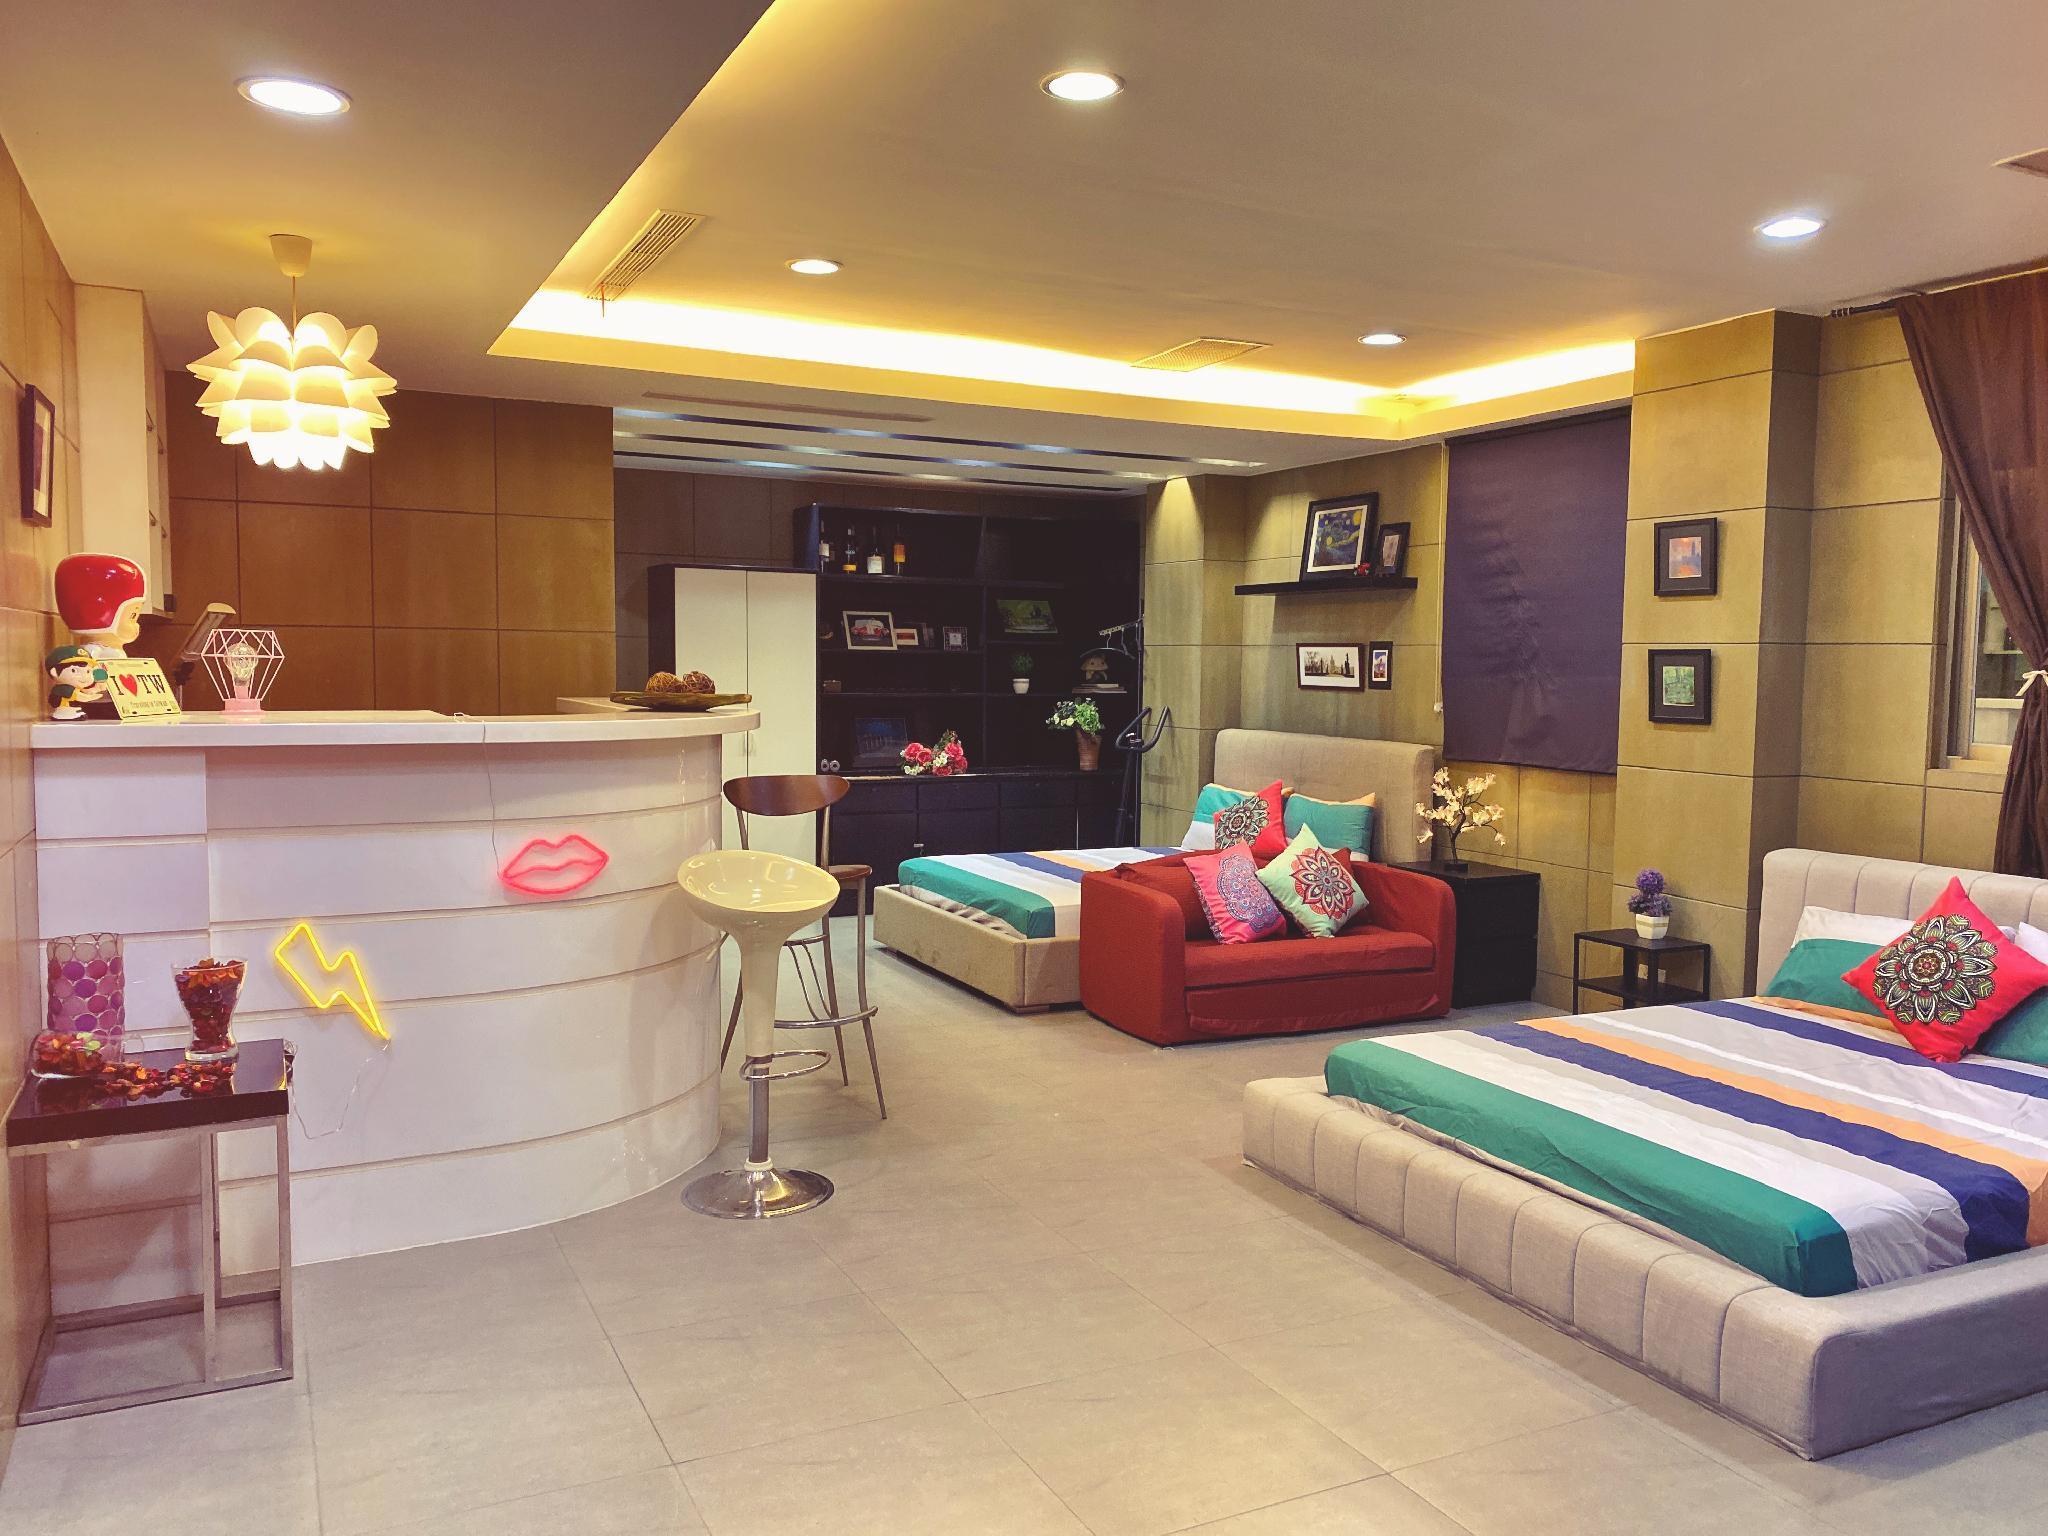 Taipei Station Club House 3rm3bth 4 14 Guests